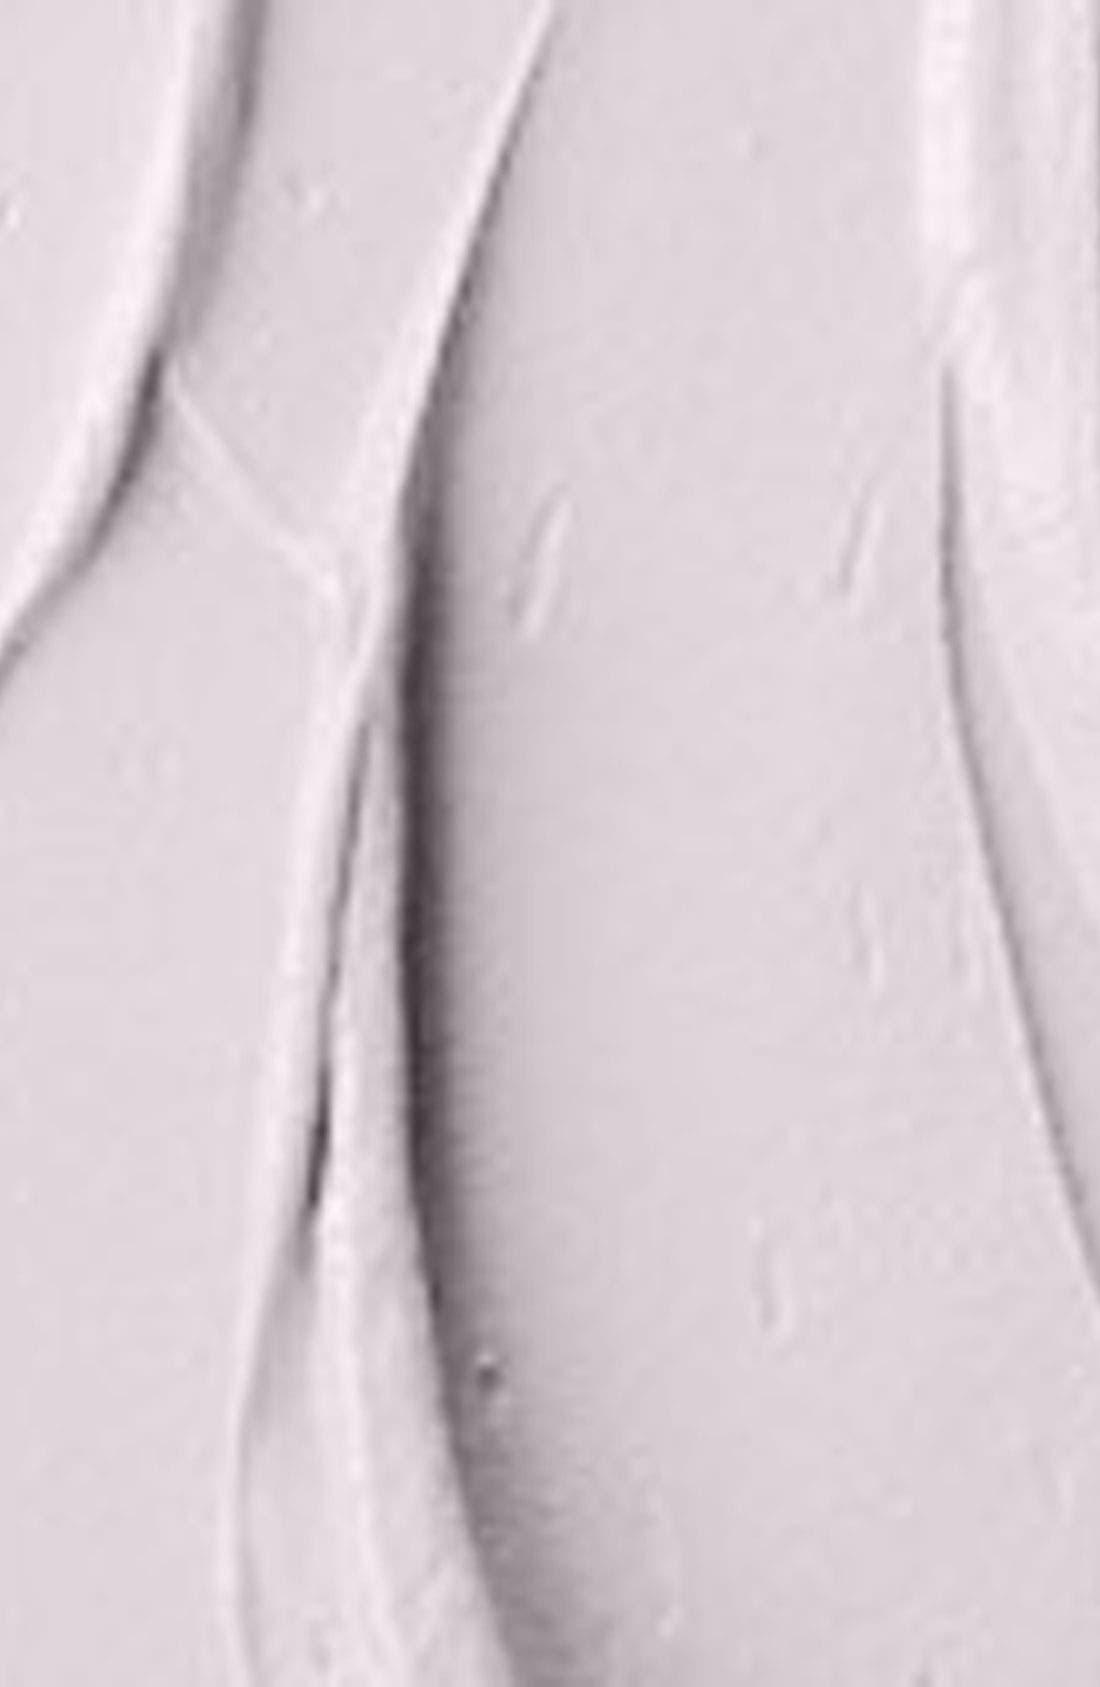 M·A·C 'Pro Longwear' Lip Creme,                             Main thumbnail 1, color,                             020